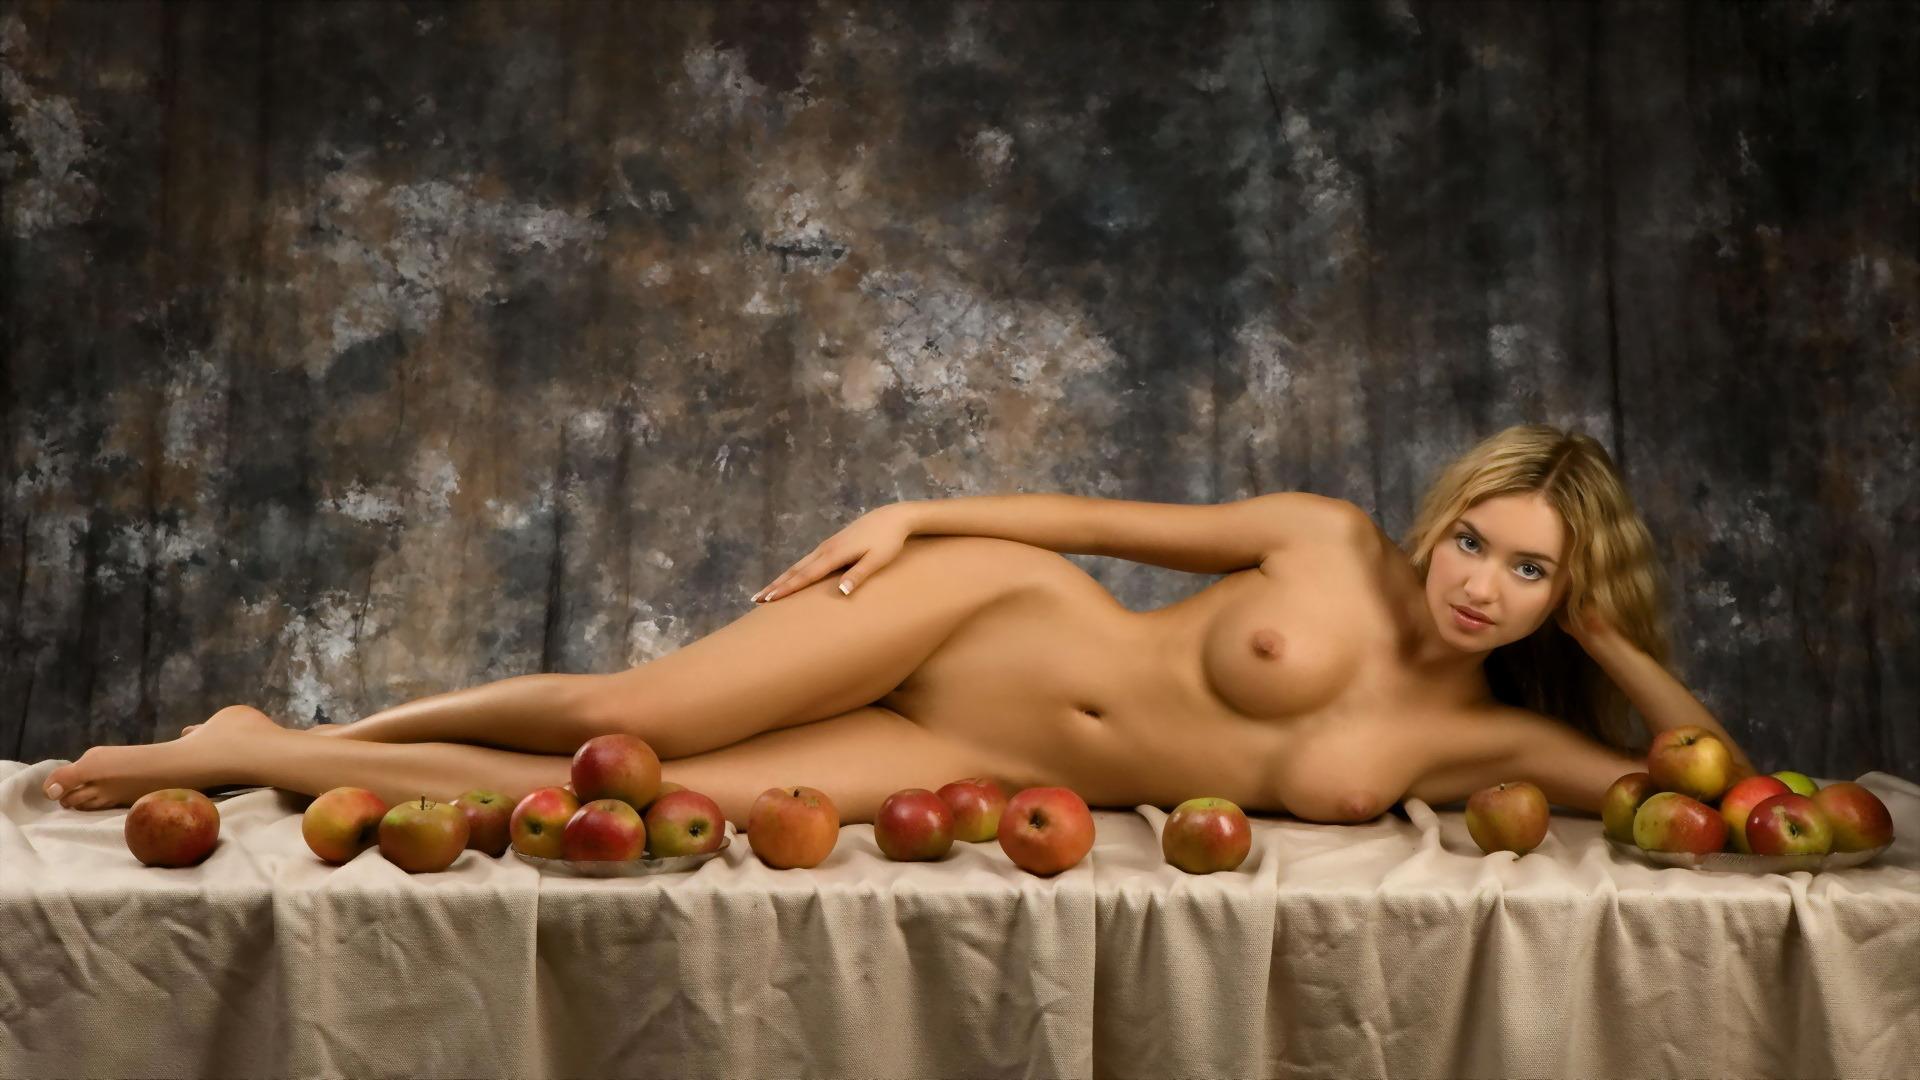 Эротика секси картинки девушки 17 фотография